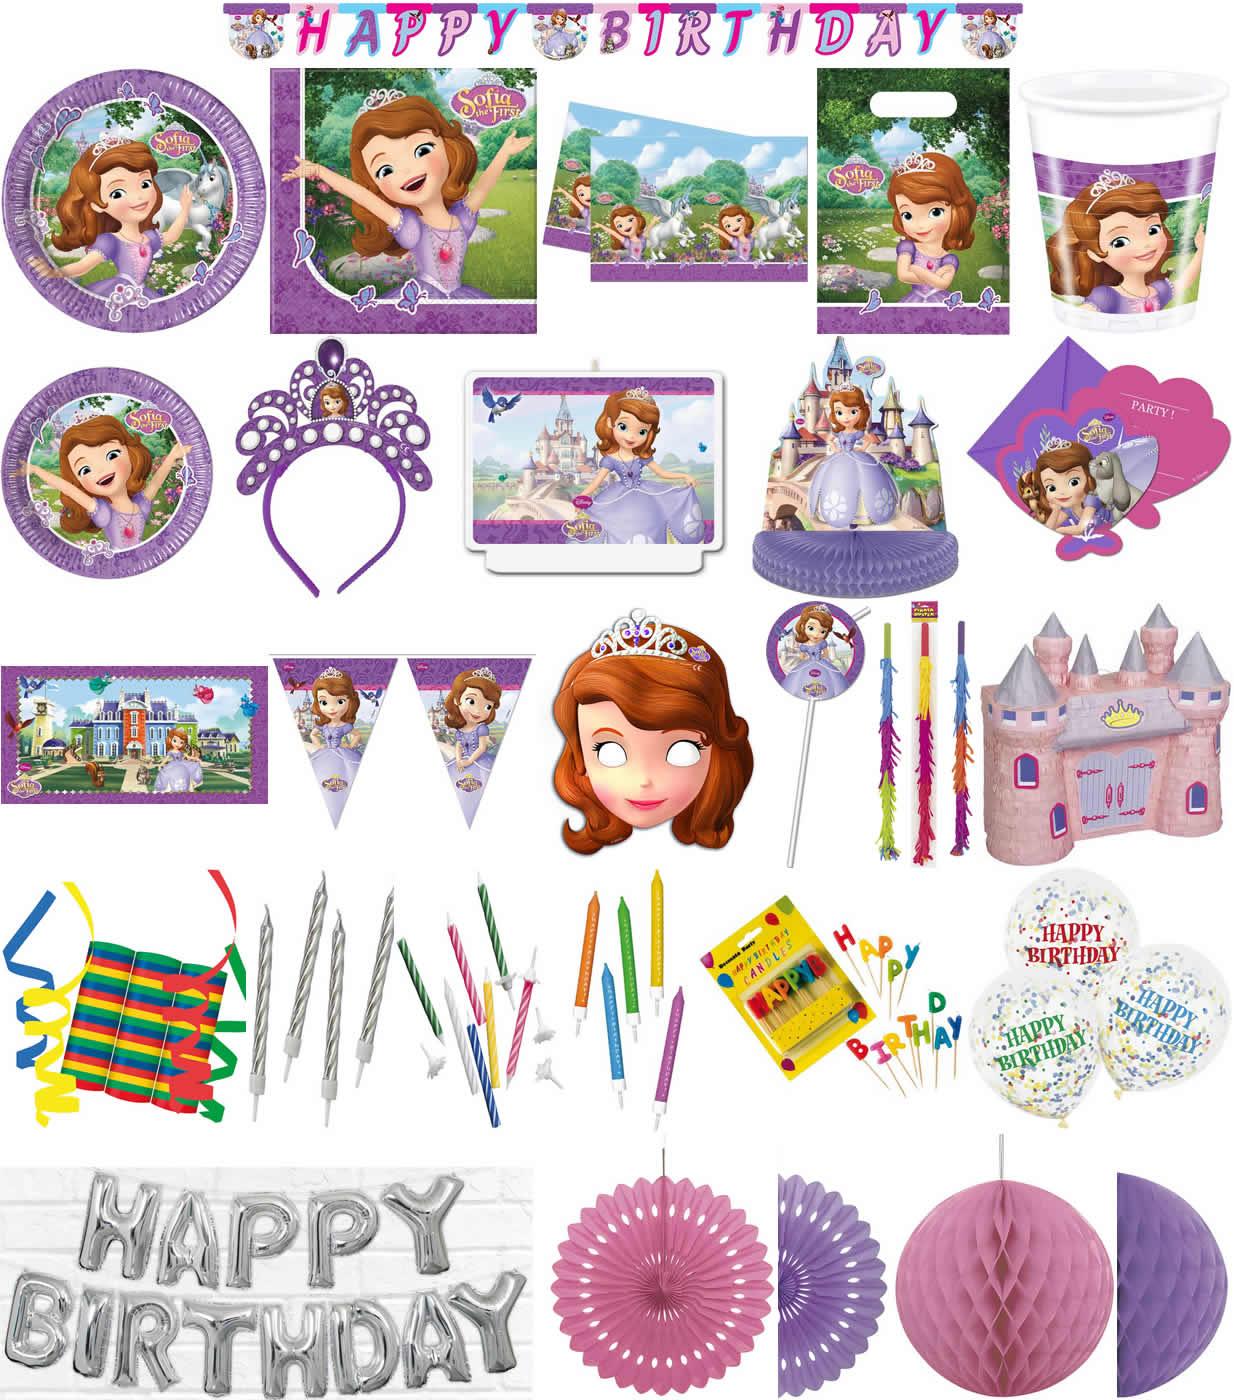 Kinder-Geburtstag Party Deko Feier Fete Motto Sofia the First Mystic Isles